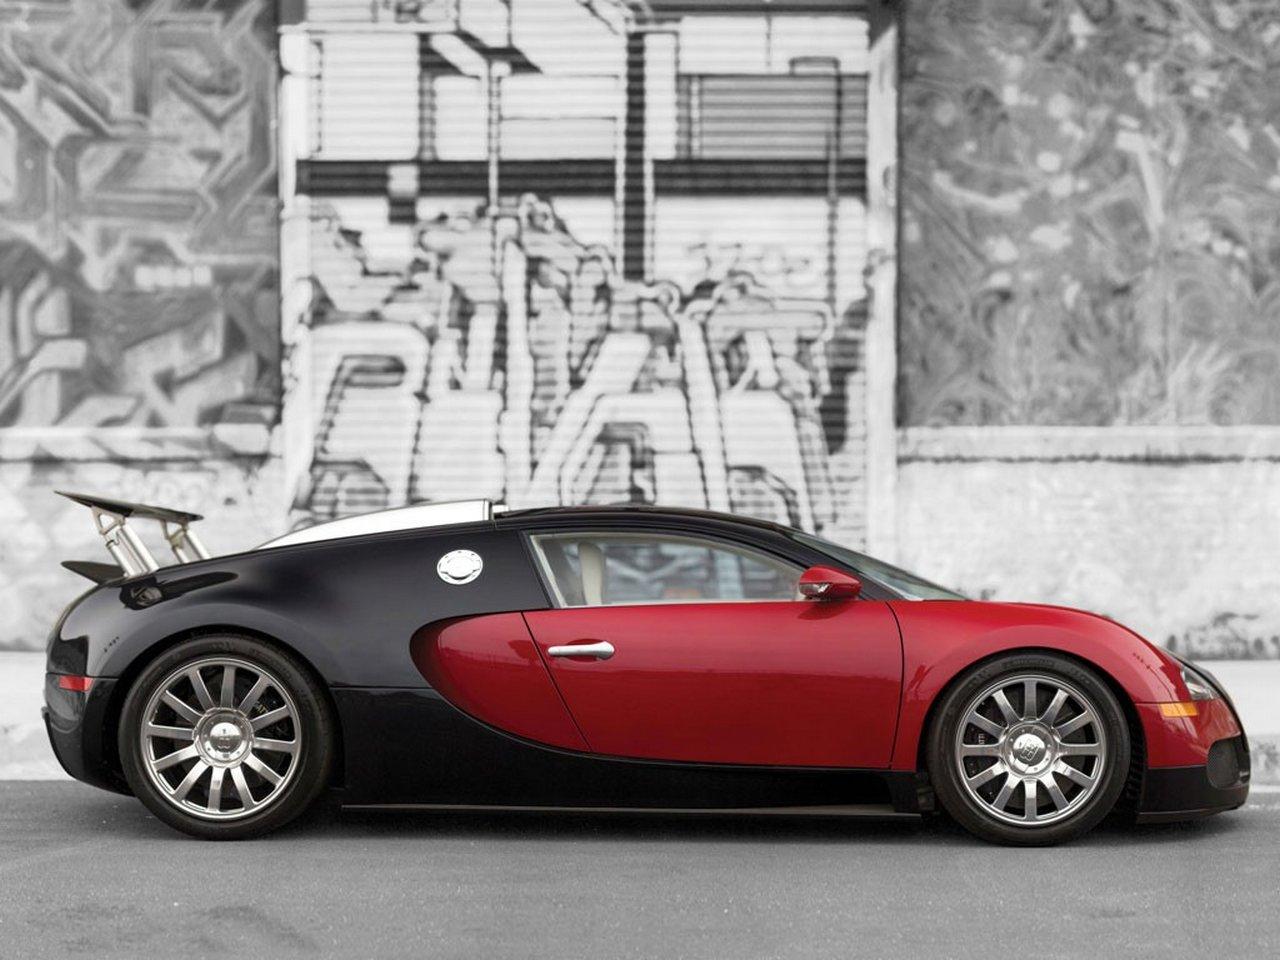 bugatti-veyron-001-2005-rm-auction-0-100-2